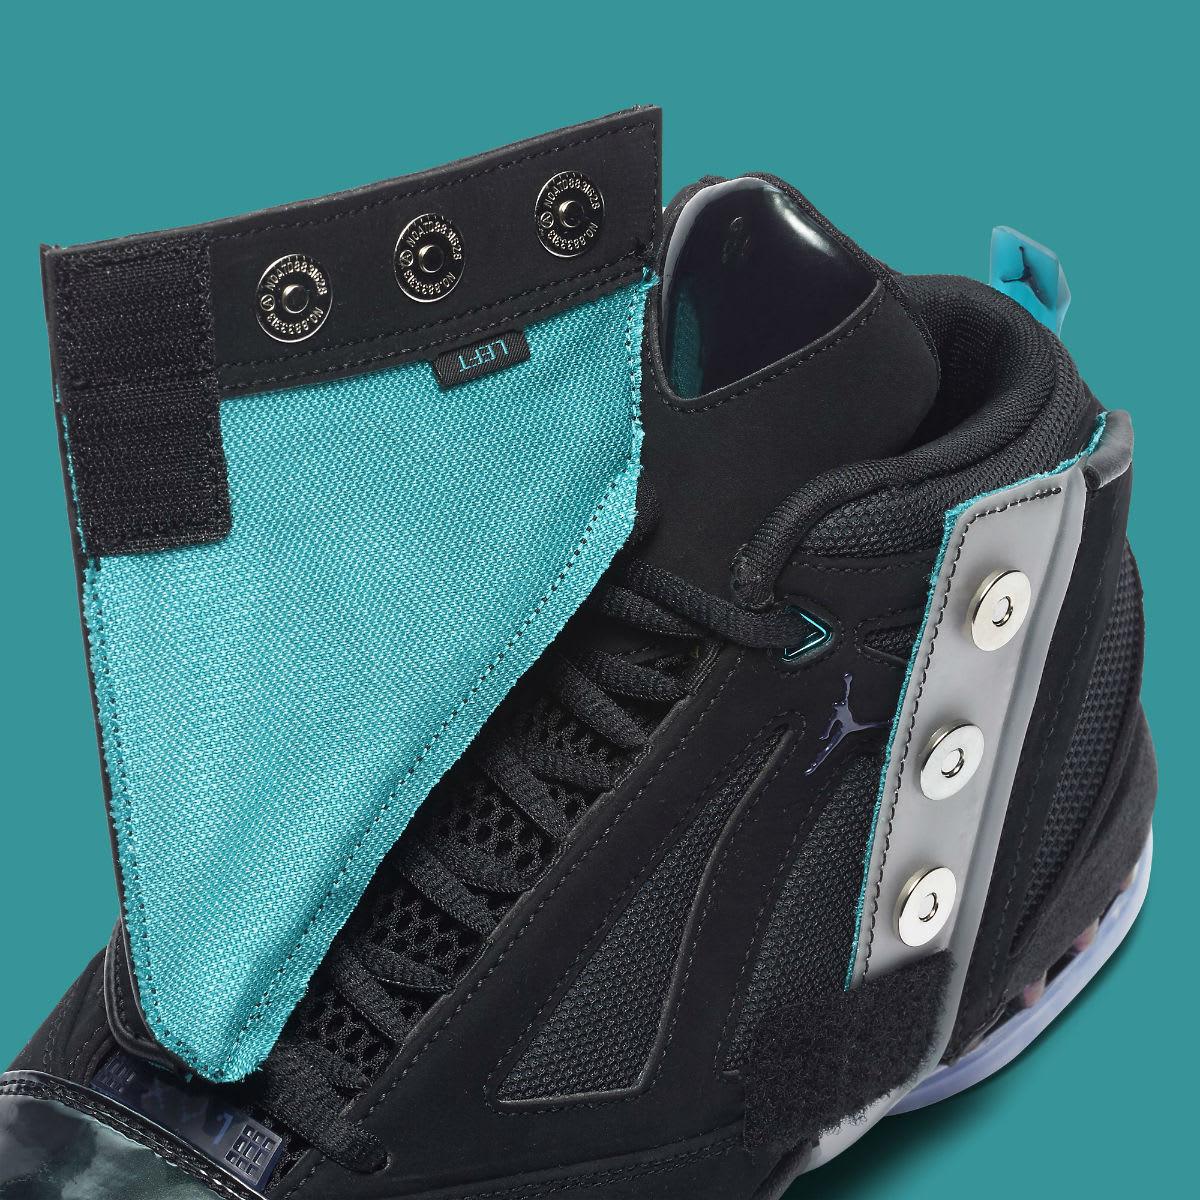 44cf23d0086 ... Air Jordan 16 XVI CEO Boardroom Release Date Shroud AA1235-003 ...